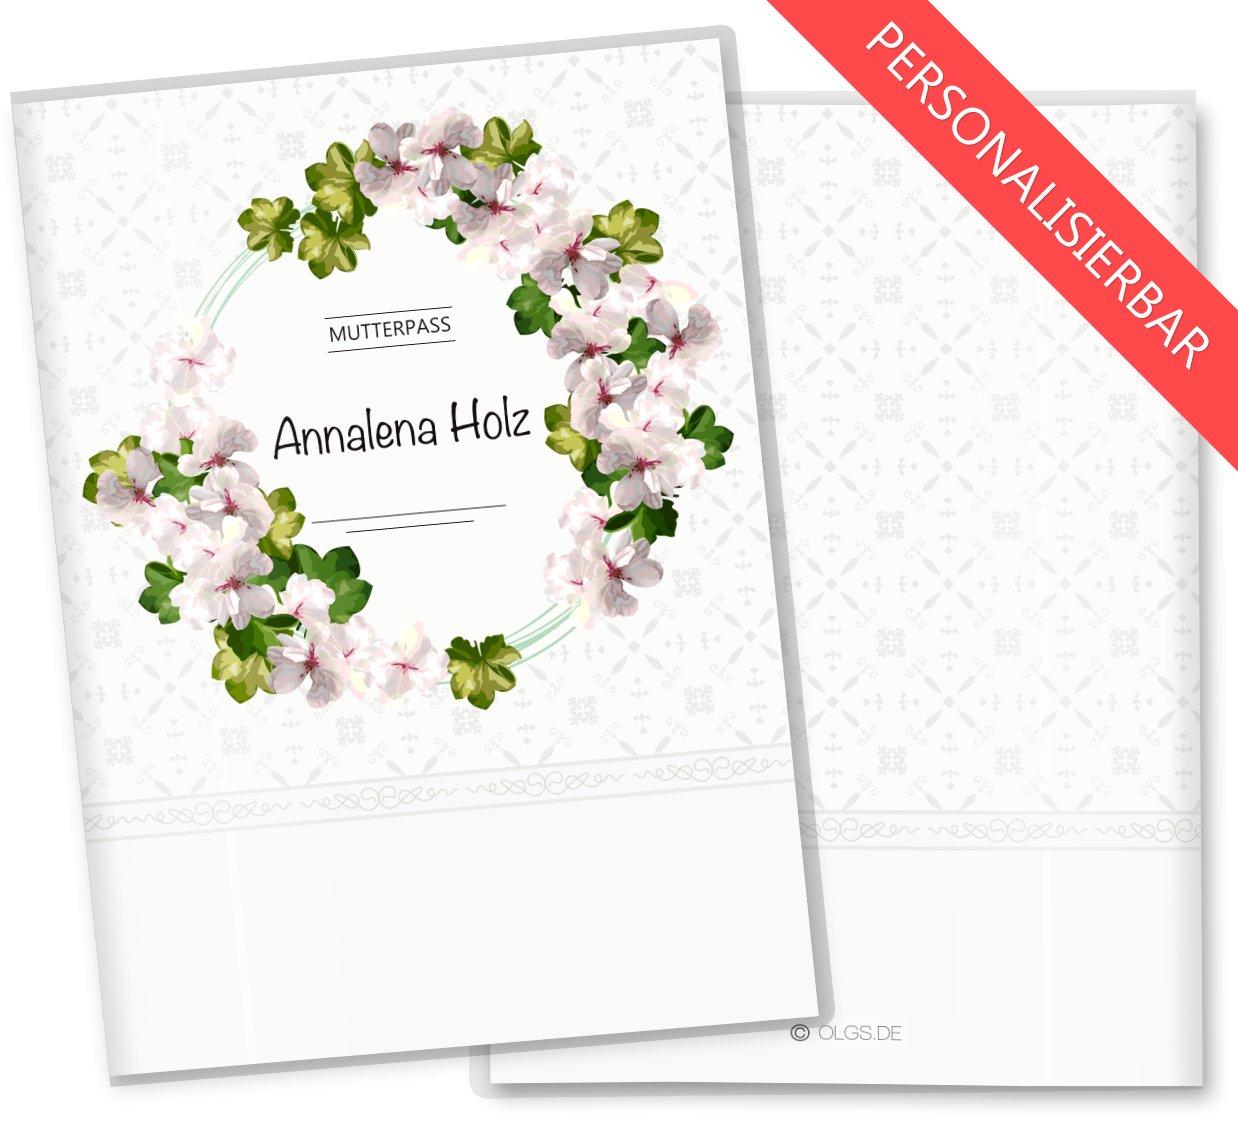 Mutterpasshülle 3-teilig Blumenkranz Schutzhülle Geschenkidee (Mutterpass ohne Personalisierung, Petunia) Olgs Babyartikel